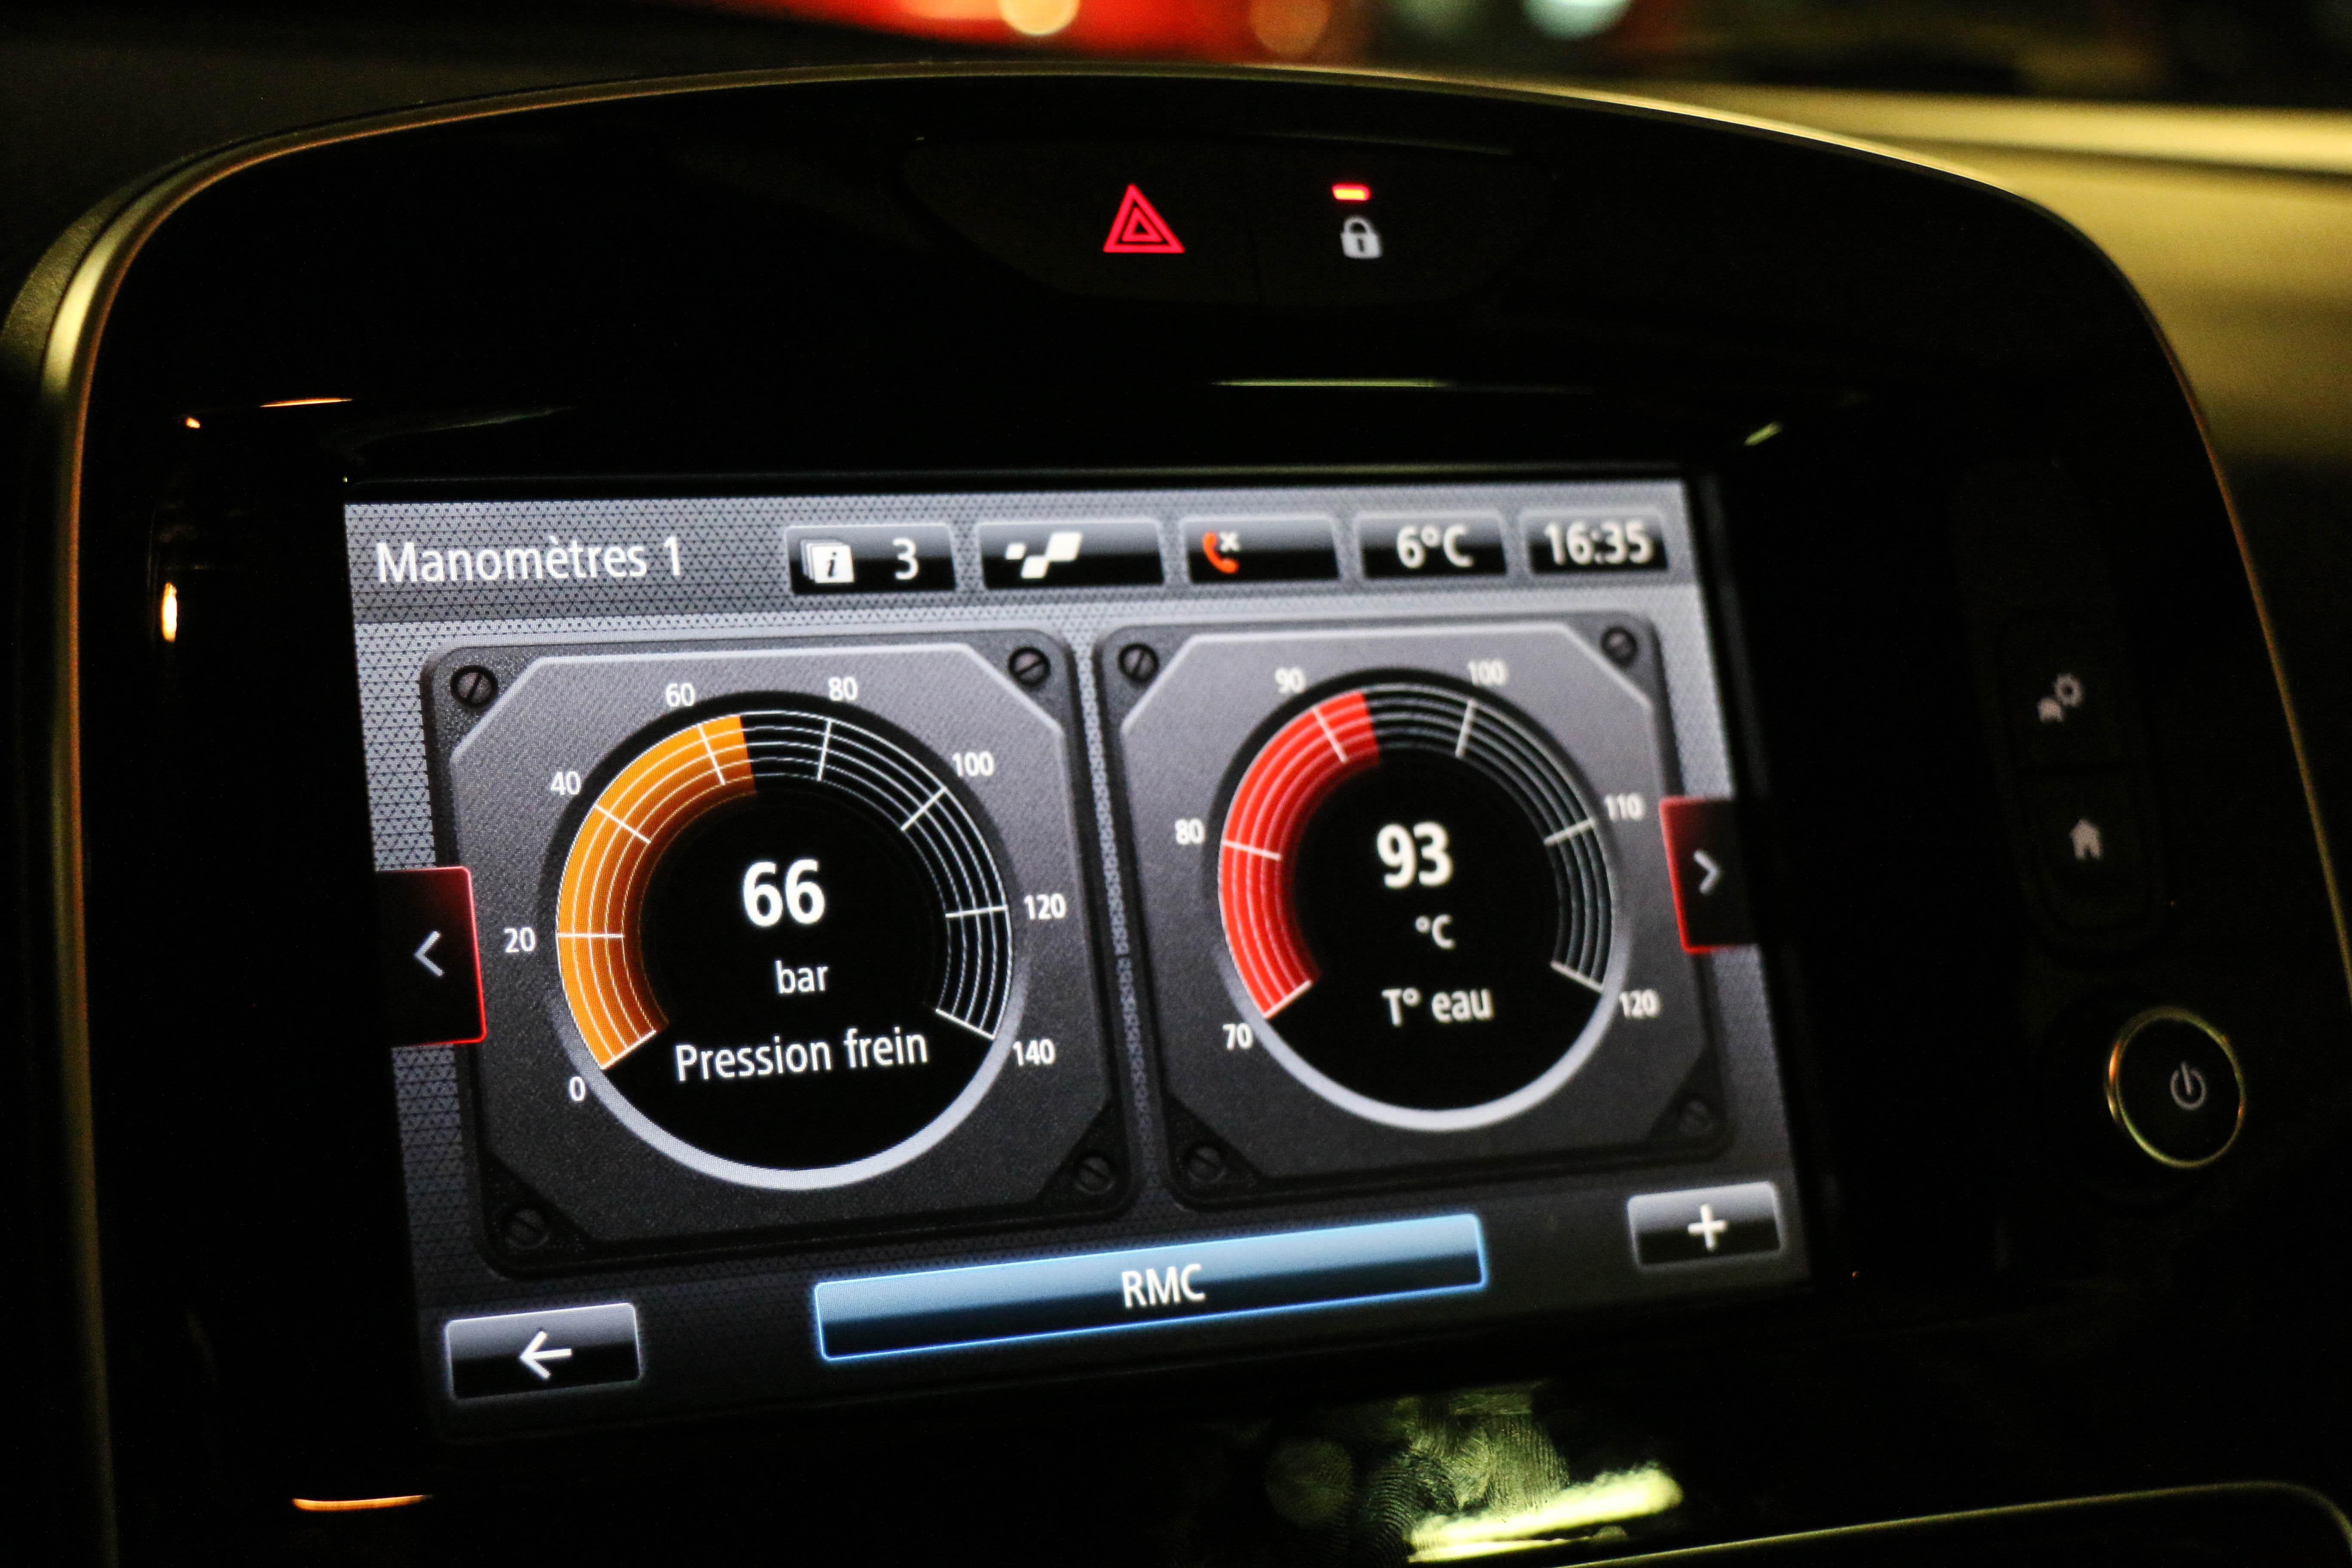 RenaultclioIVRSTrophy59-renault-clio-RS-trophy-intérieur-onboard-Arnaud Demasier-RSPhotographie